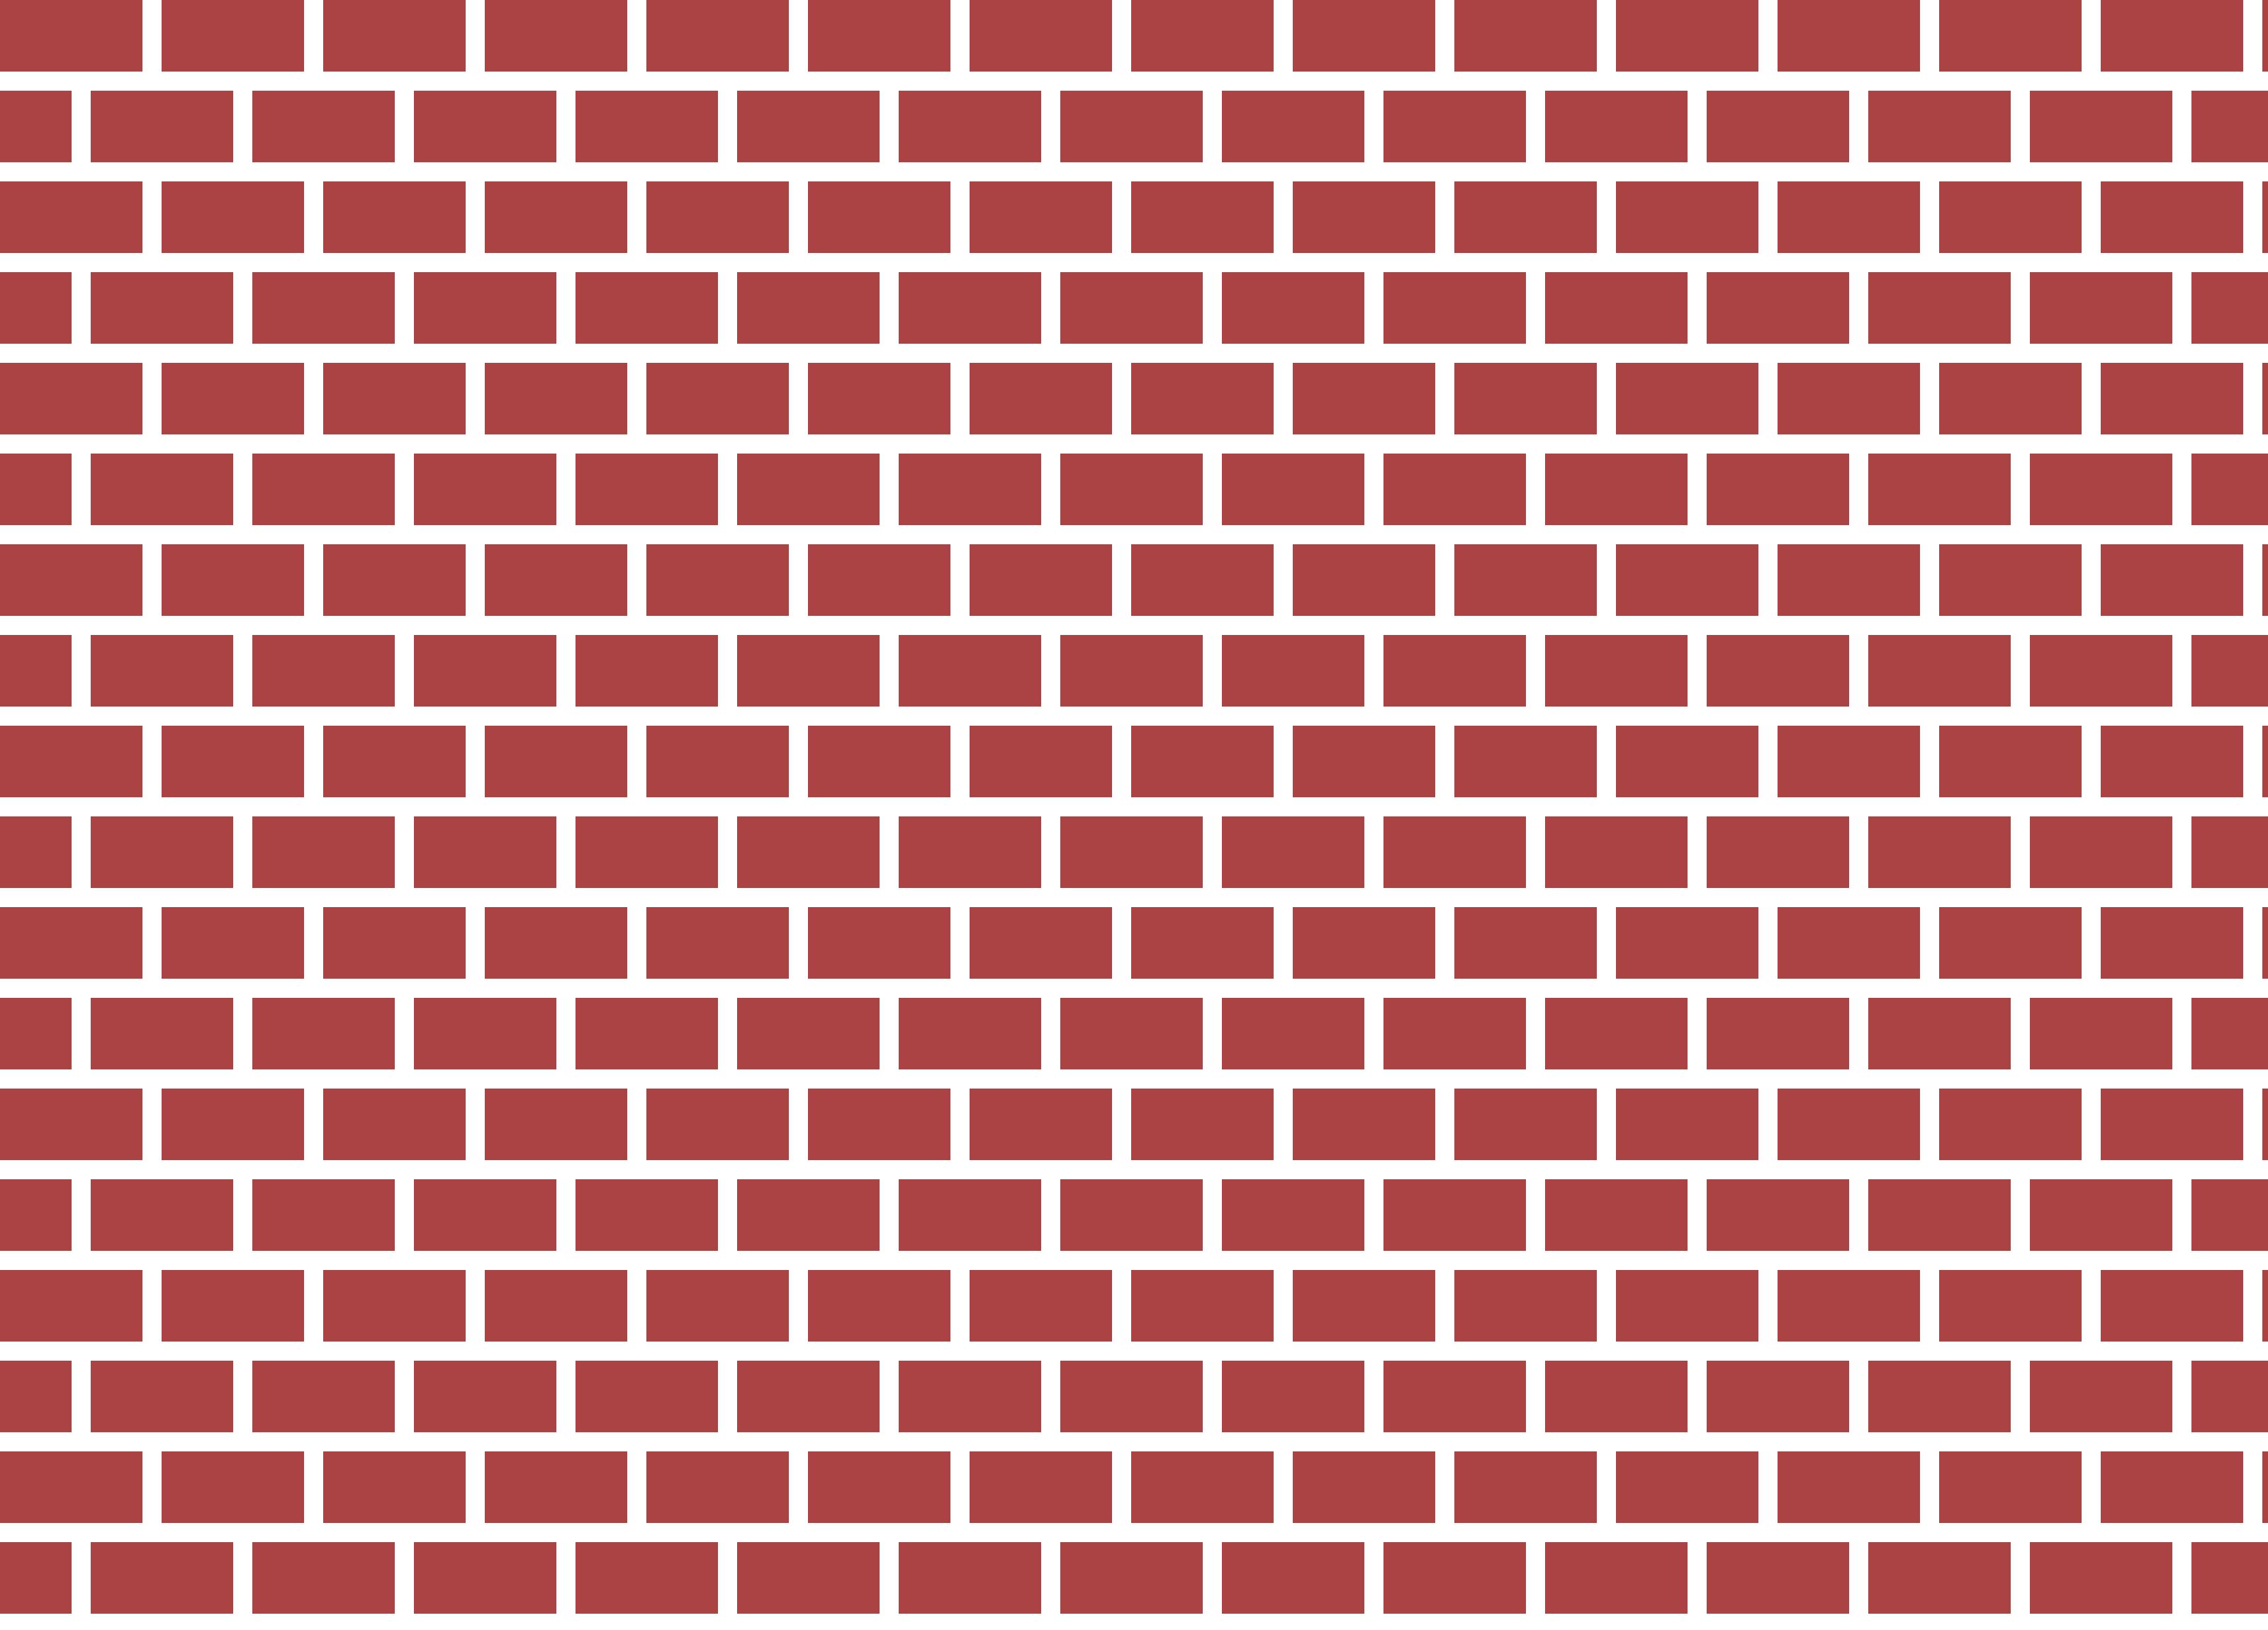 brick clipart